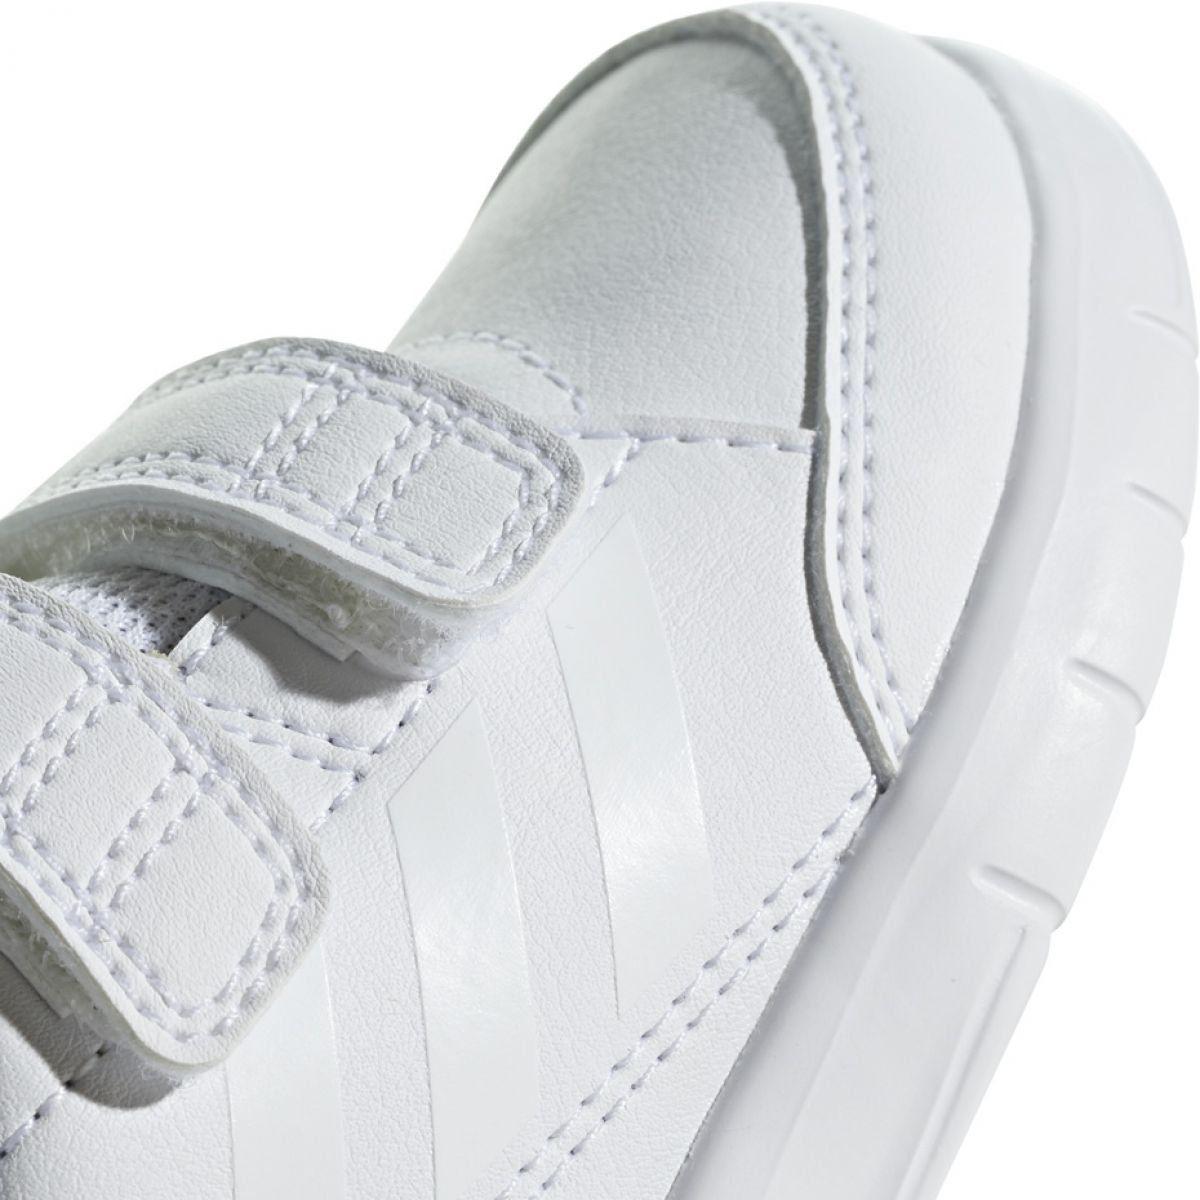 Adidas AltaSport Cf I D96848 shoes white | Kid shoes, Adidas